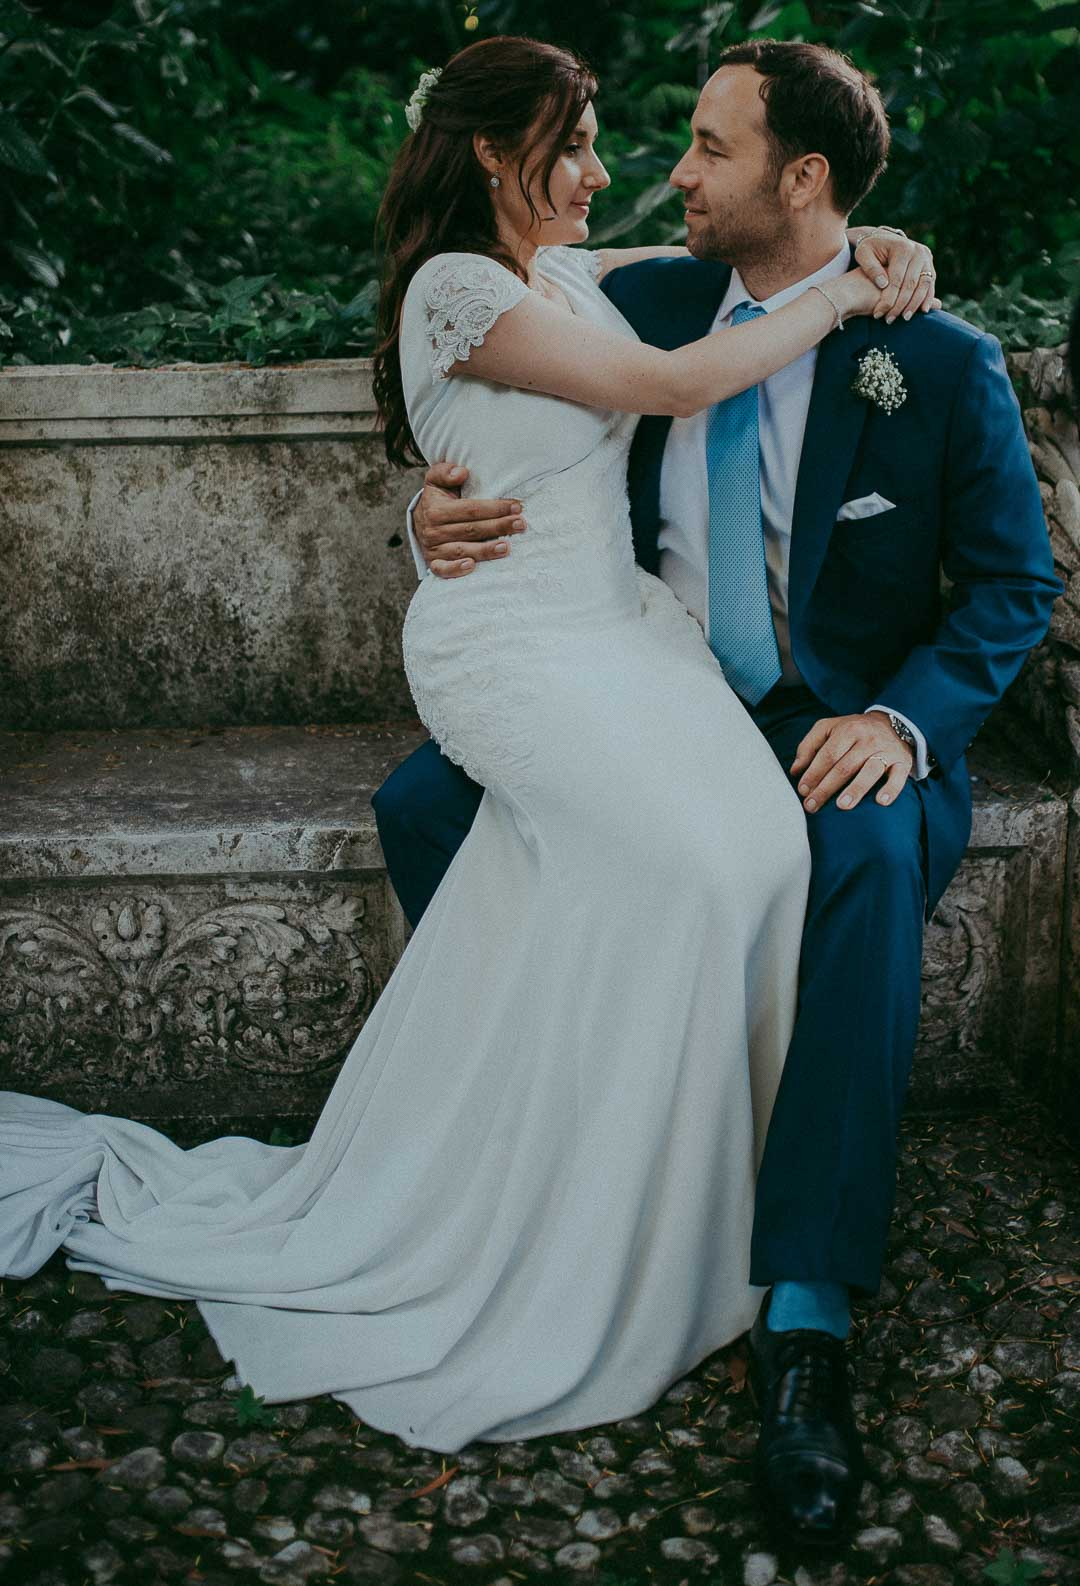 wedding-photographer-destination-fineart-bespoke-reportage-sorrento-parcodeiprincipi-vivianeizzo-spazio46-87